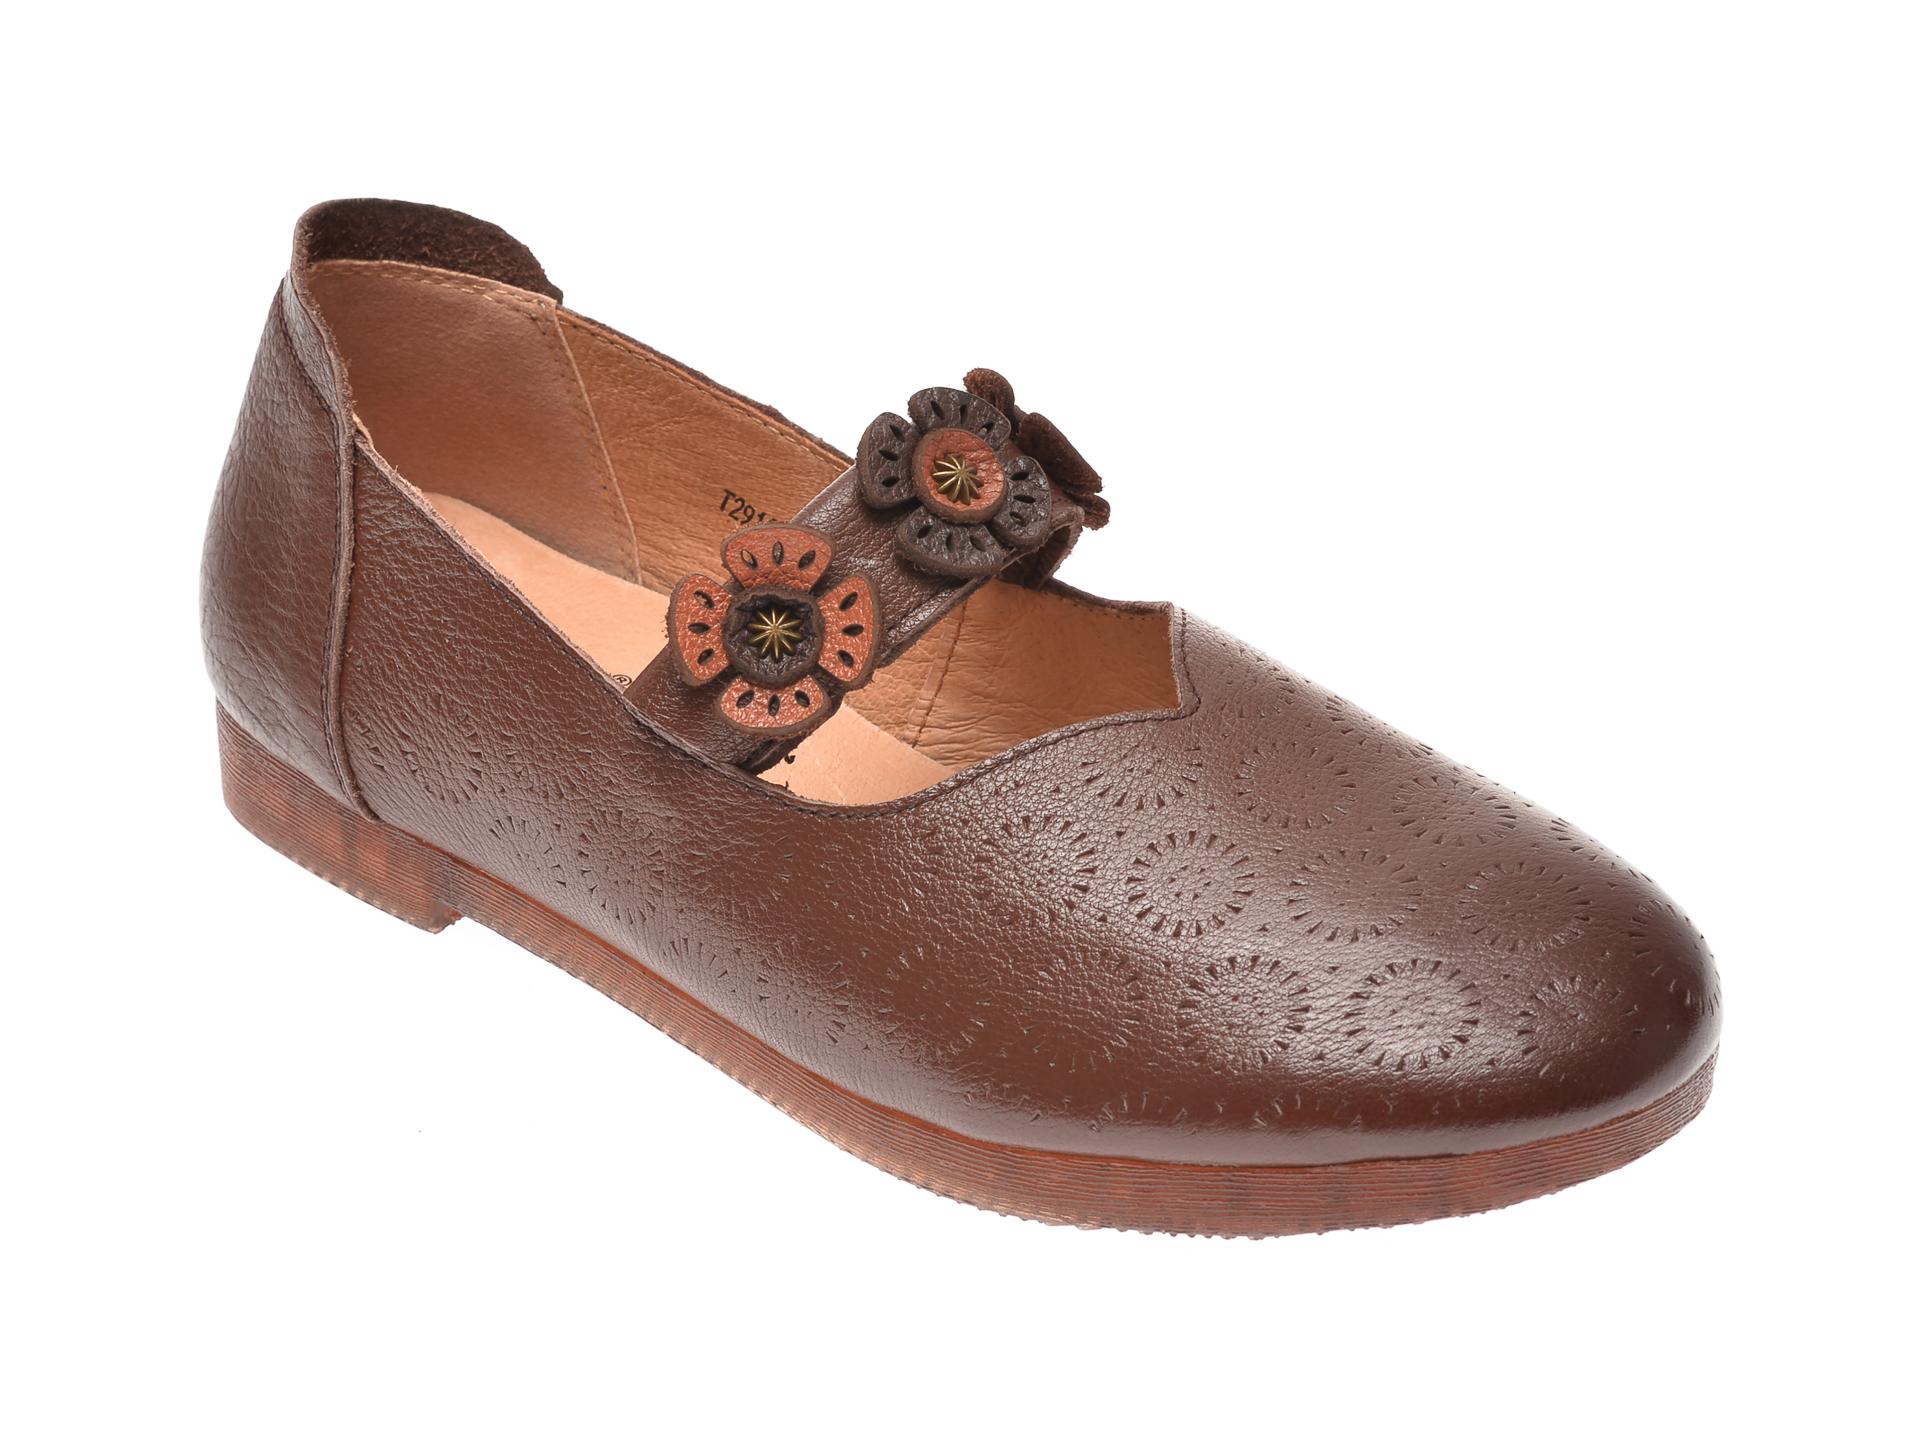 Pantofi PASS COLLECTION maro, T29113, din piele naturala